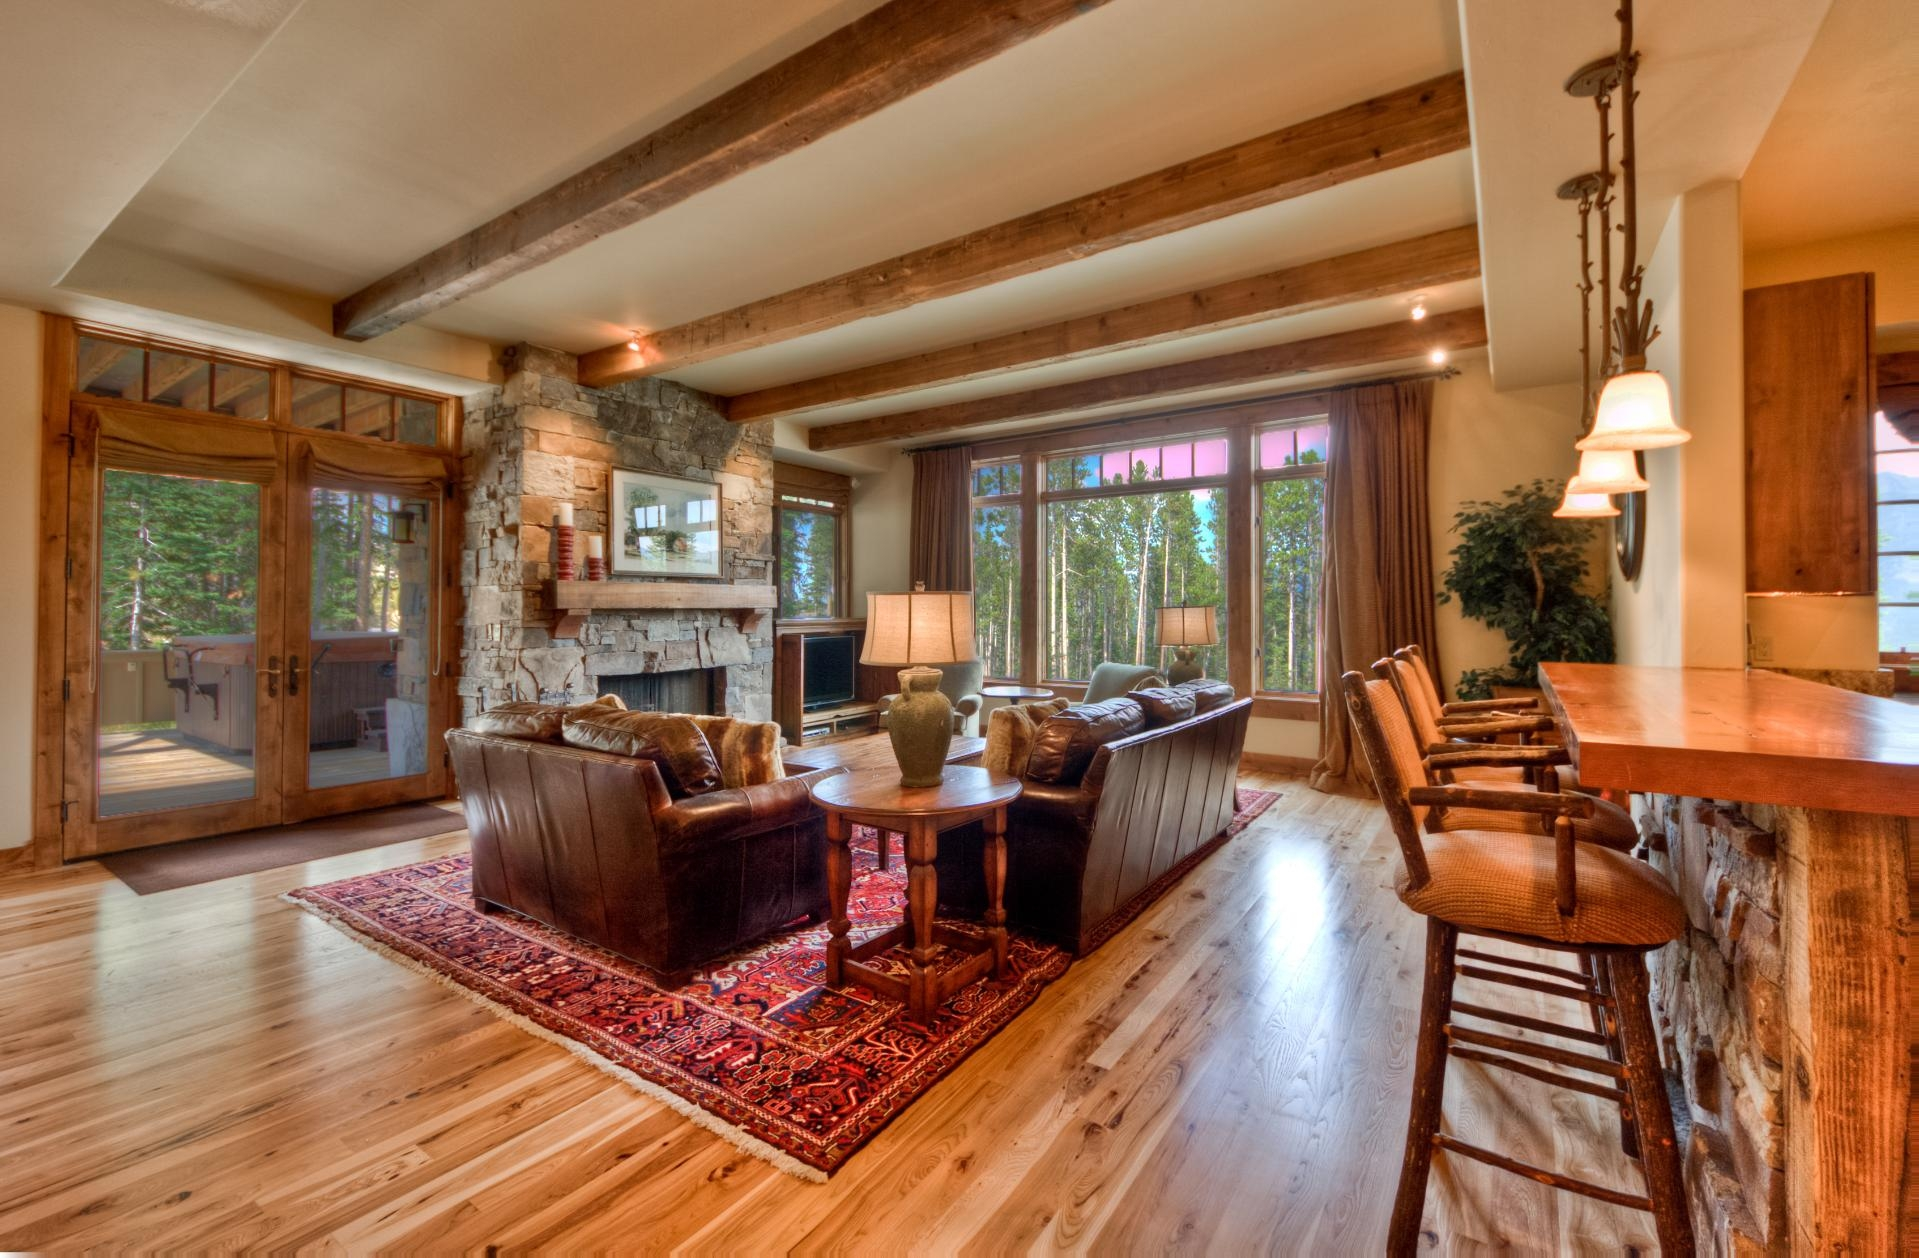 Luxury vacation rentals usa - Montana - Big sky - Cowboy heaven - 2B - Image 1/27